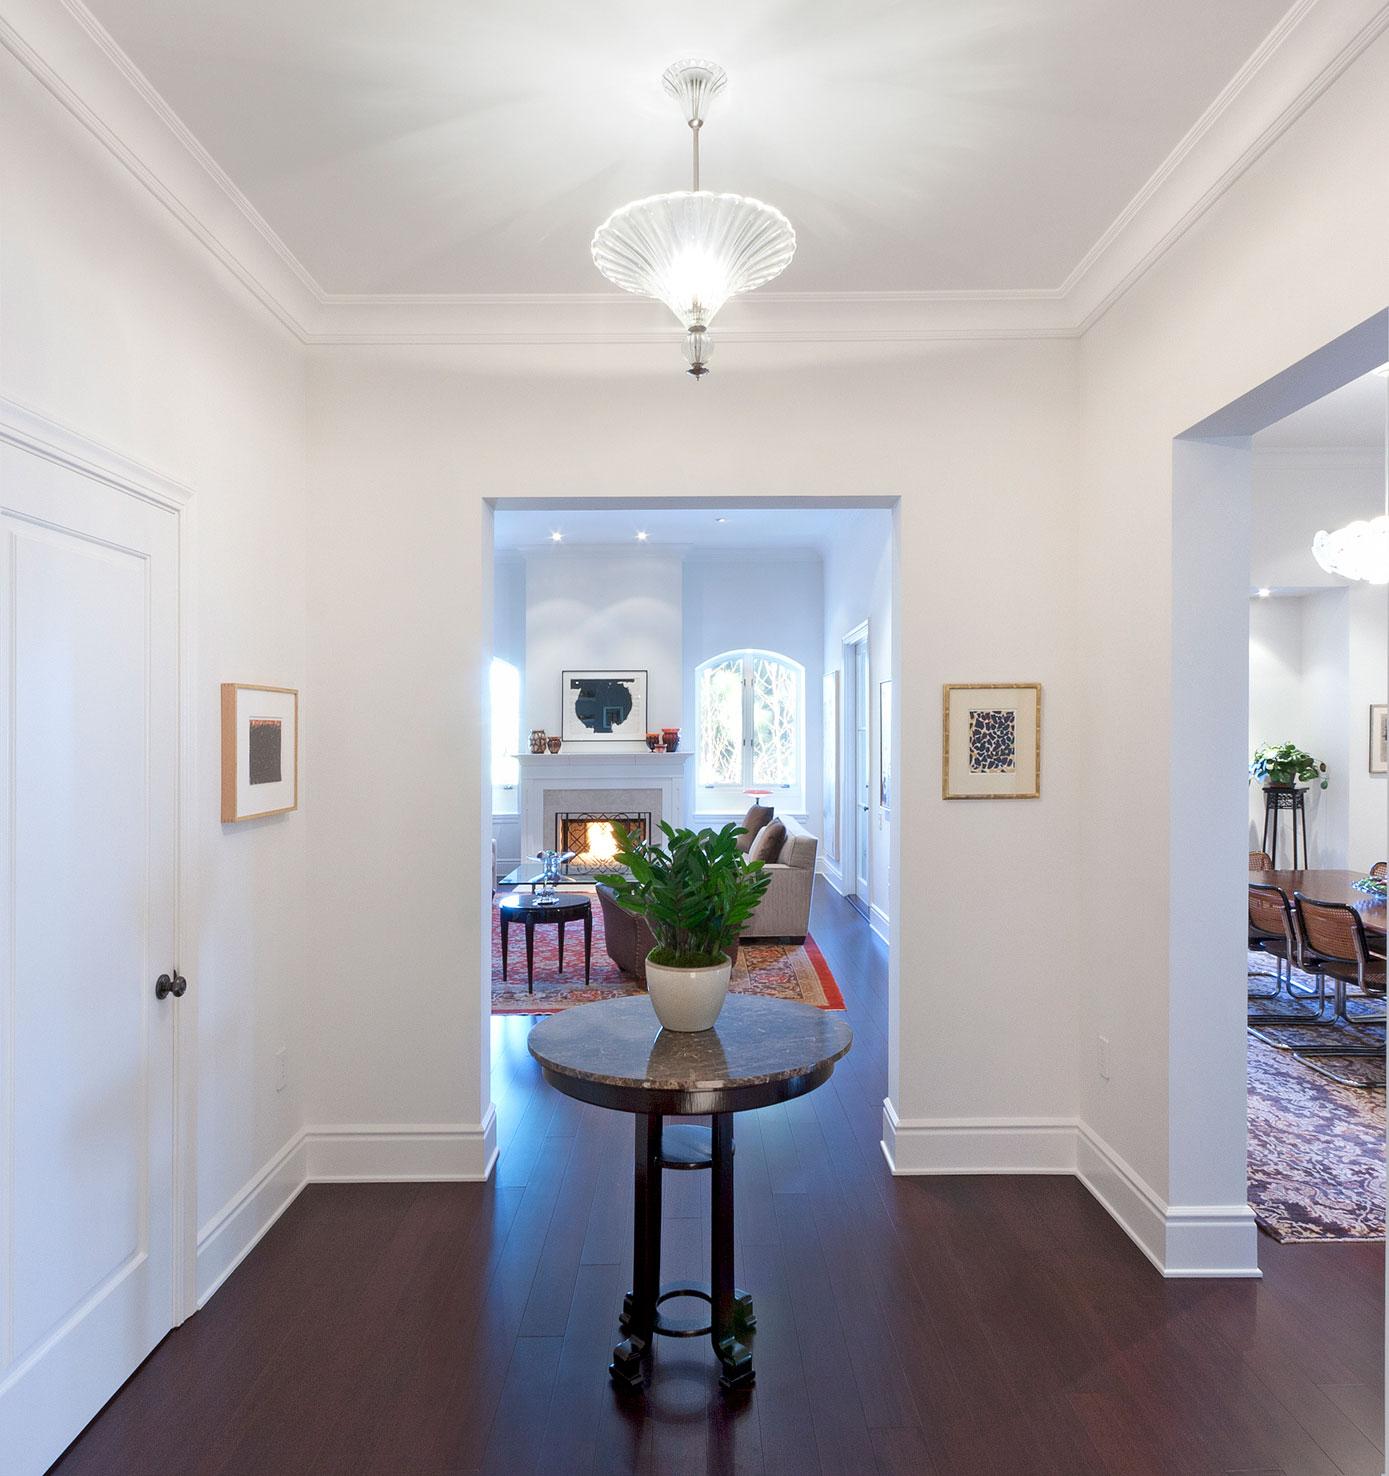 01-Transitional-Entryway-hardwood-floors-gary-drake-general-contractor.jpg